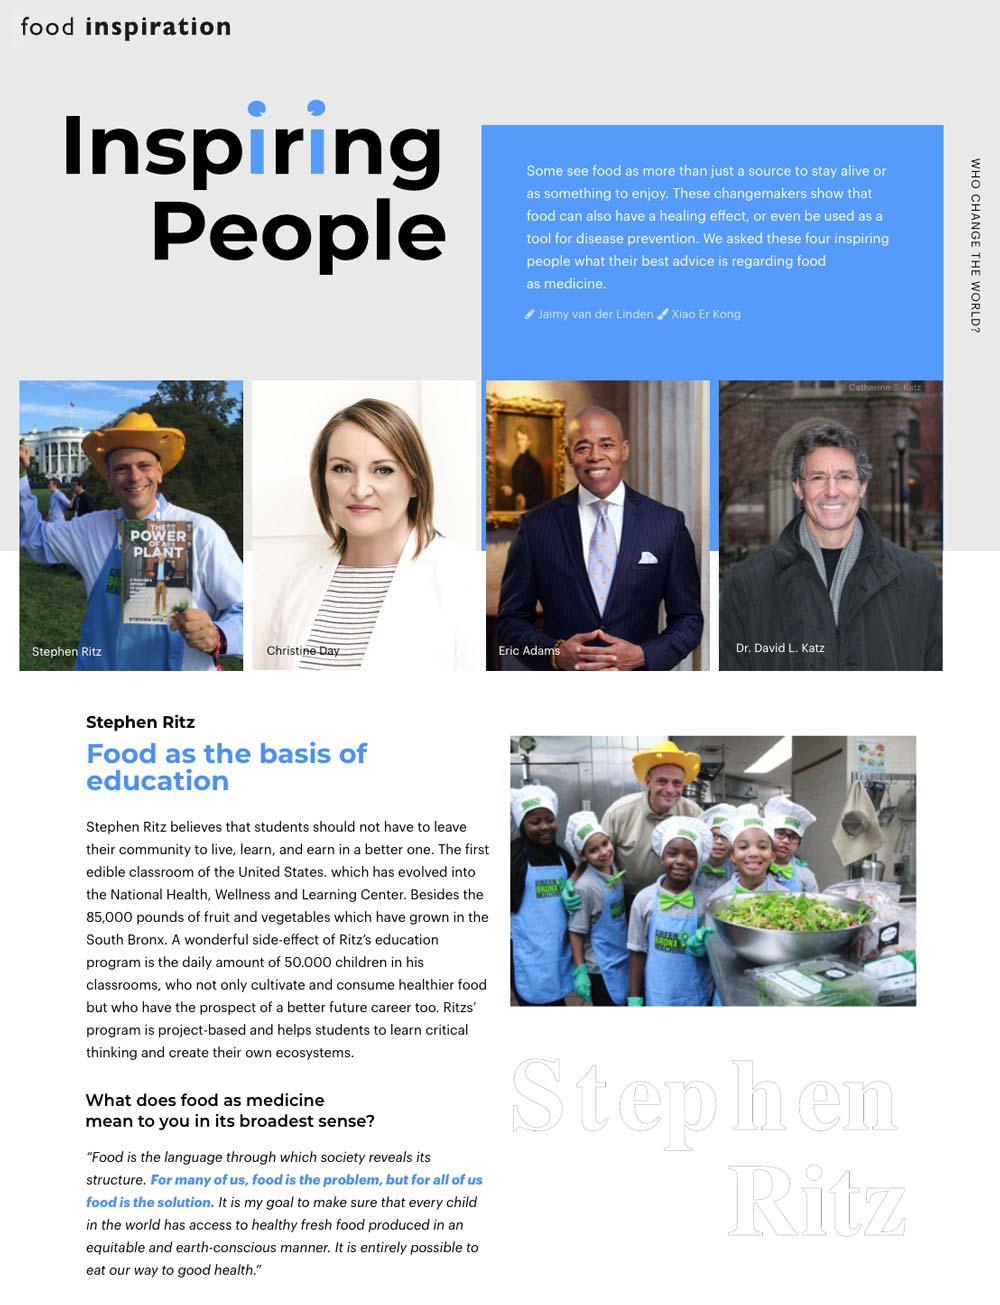 2020-03-01-foodinspirationmagazine-en-US-18771-259165-inspiring-people-html